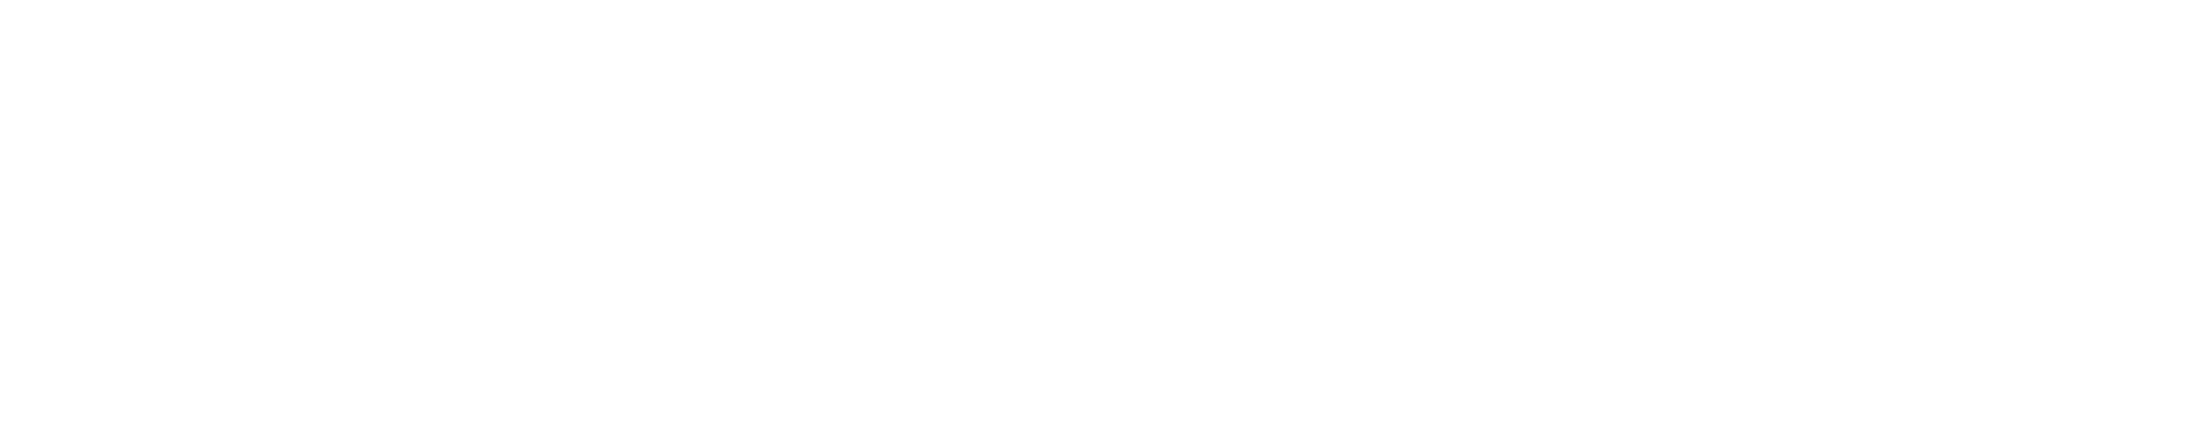 MegaWayShakes.com